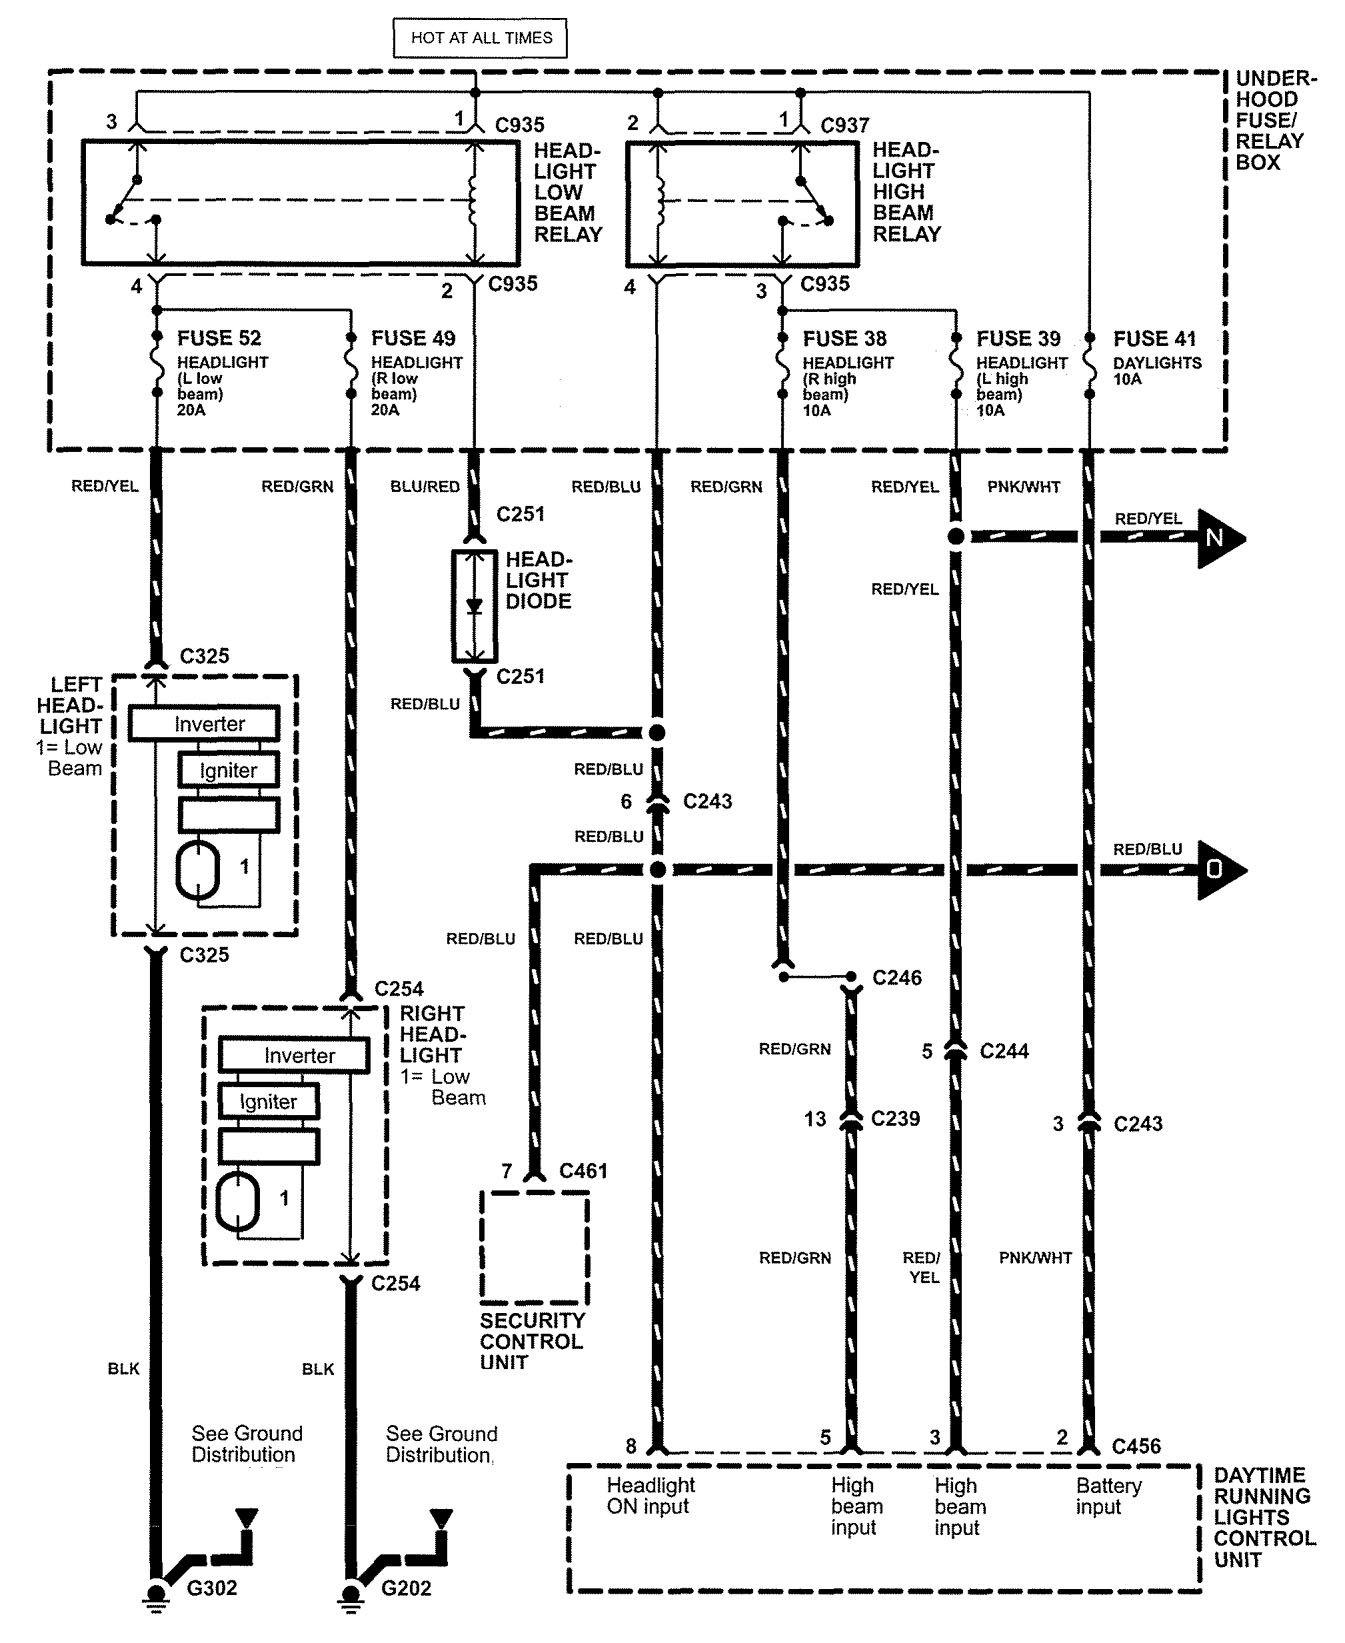 Wiring Diagram For Daytime Running Lights 5 Repliessc1st Acura Nsx 2005 U2013 Diagrams Ls